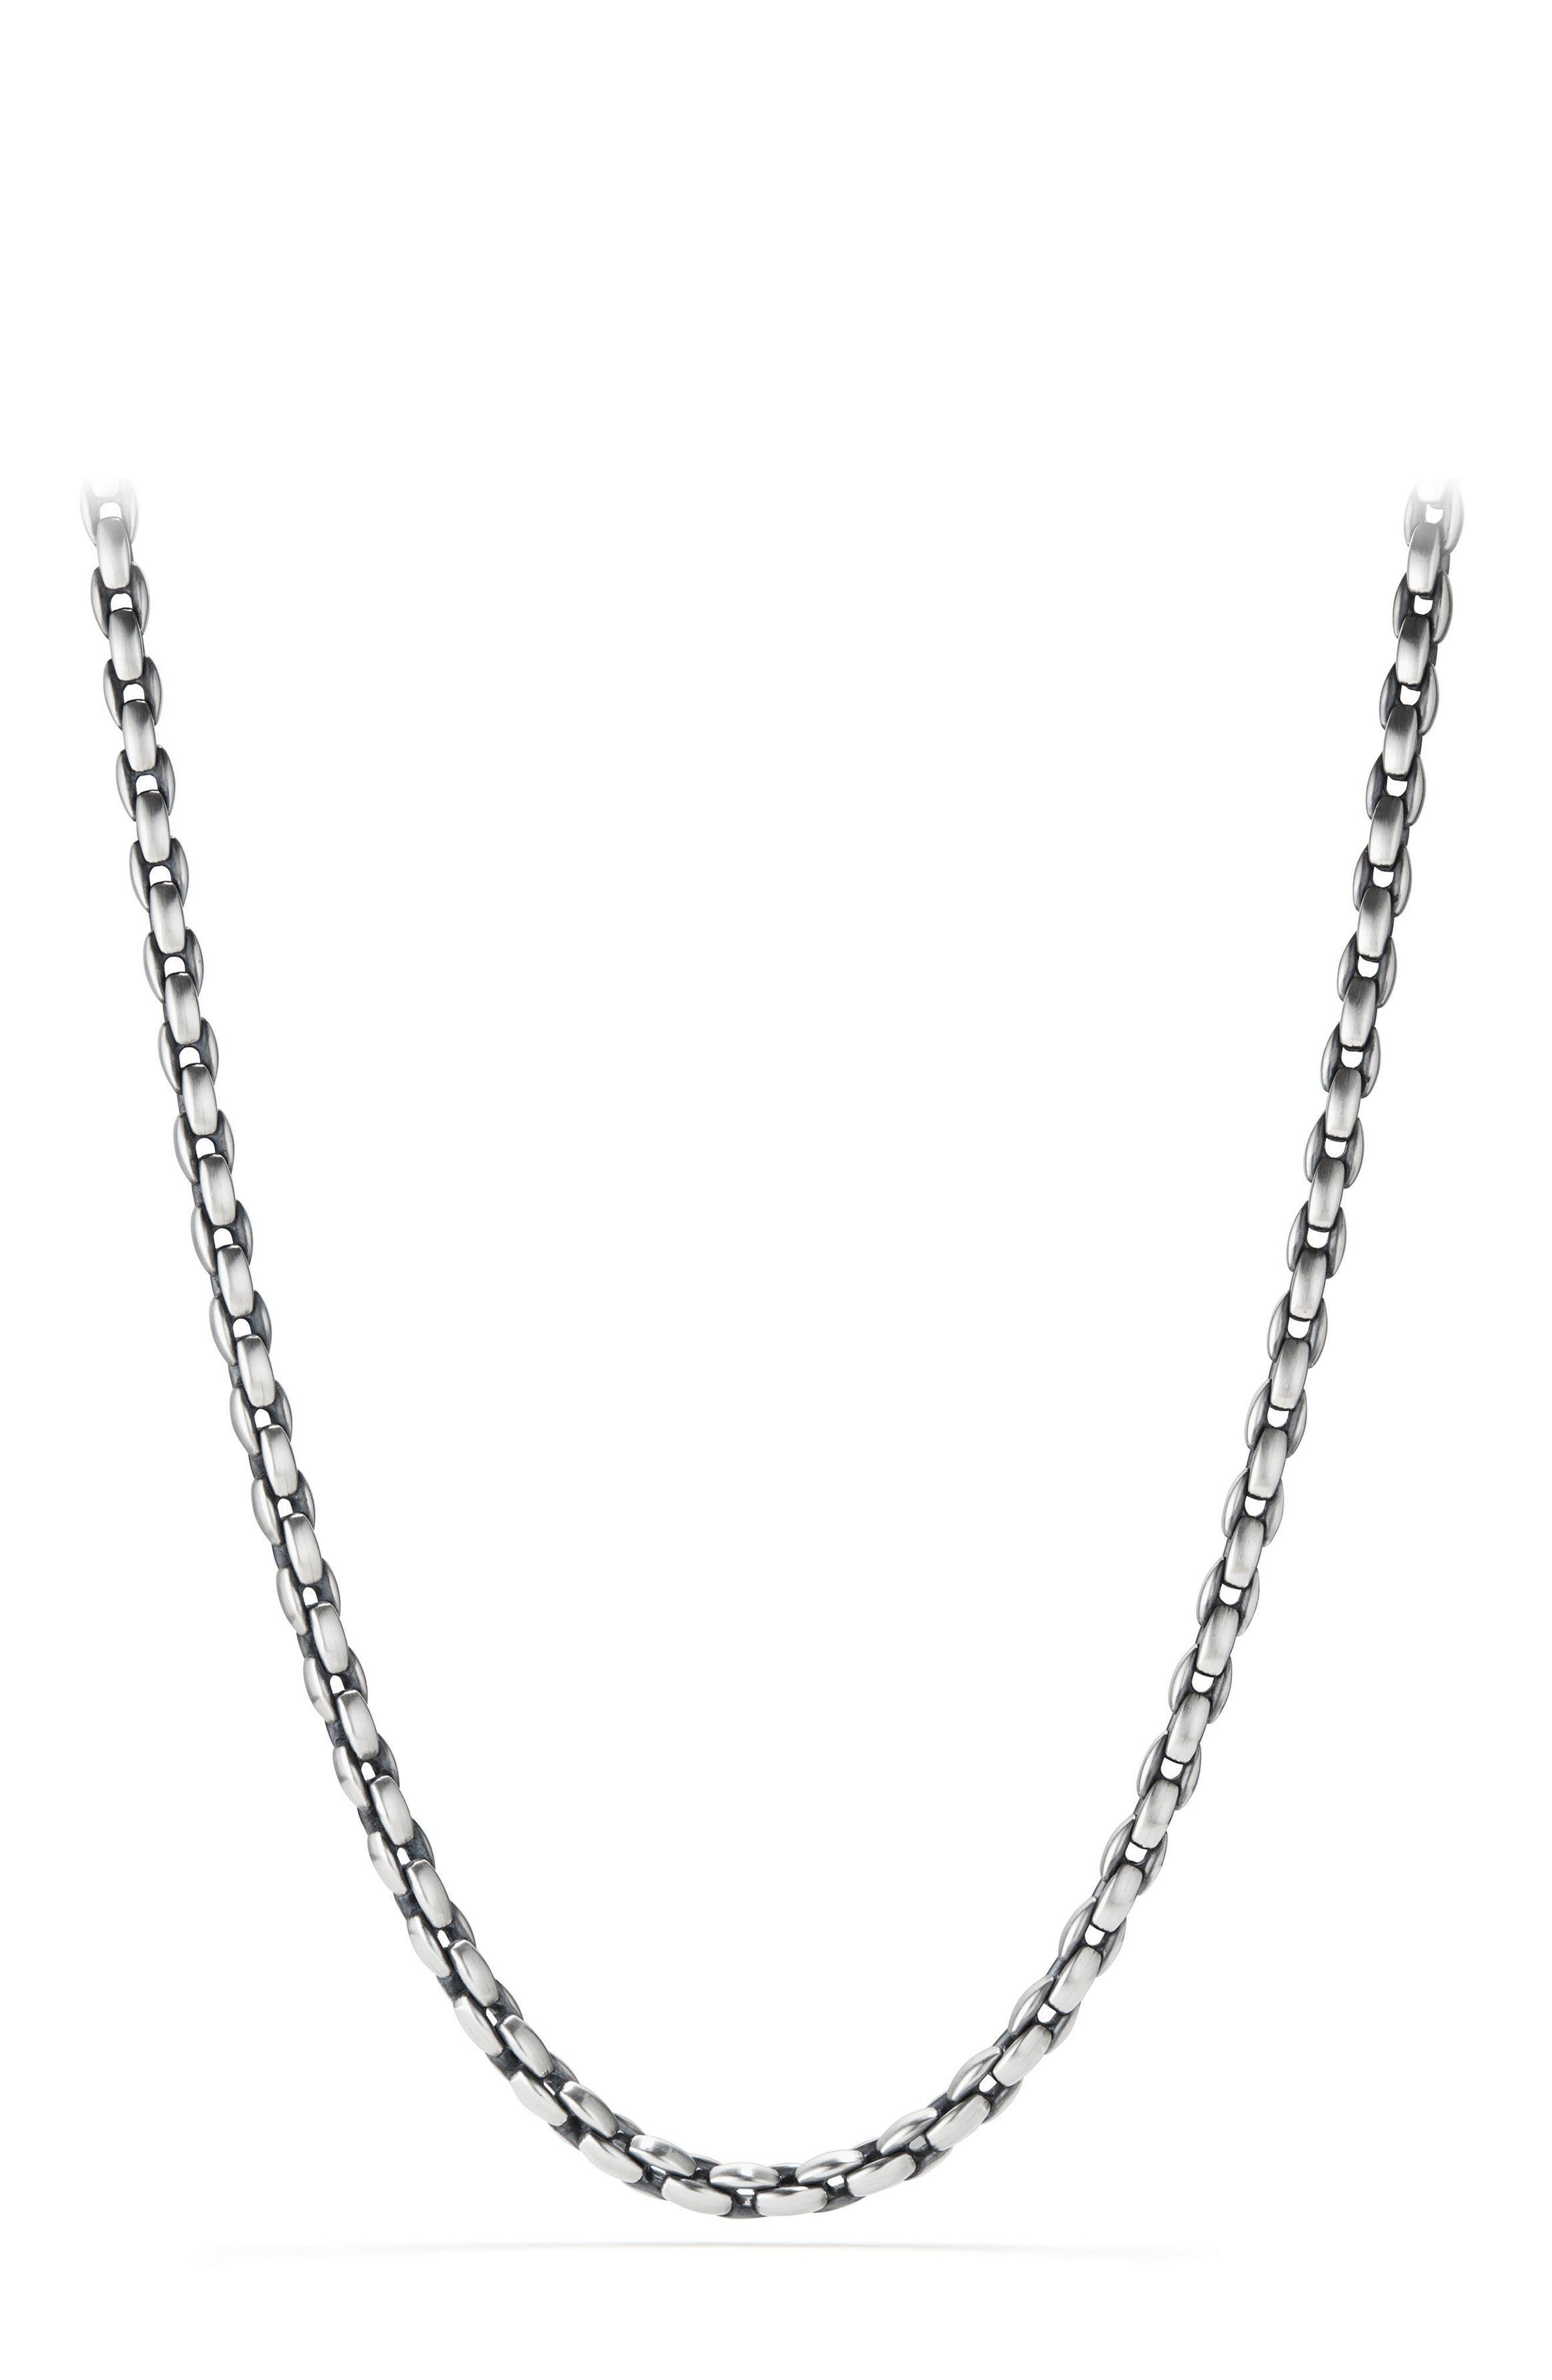 David Yurman Streamline Chain Necklace